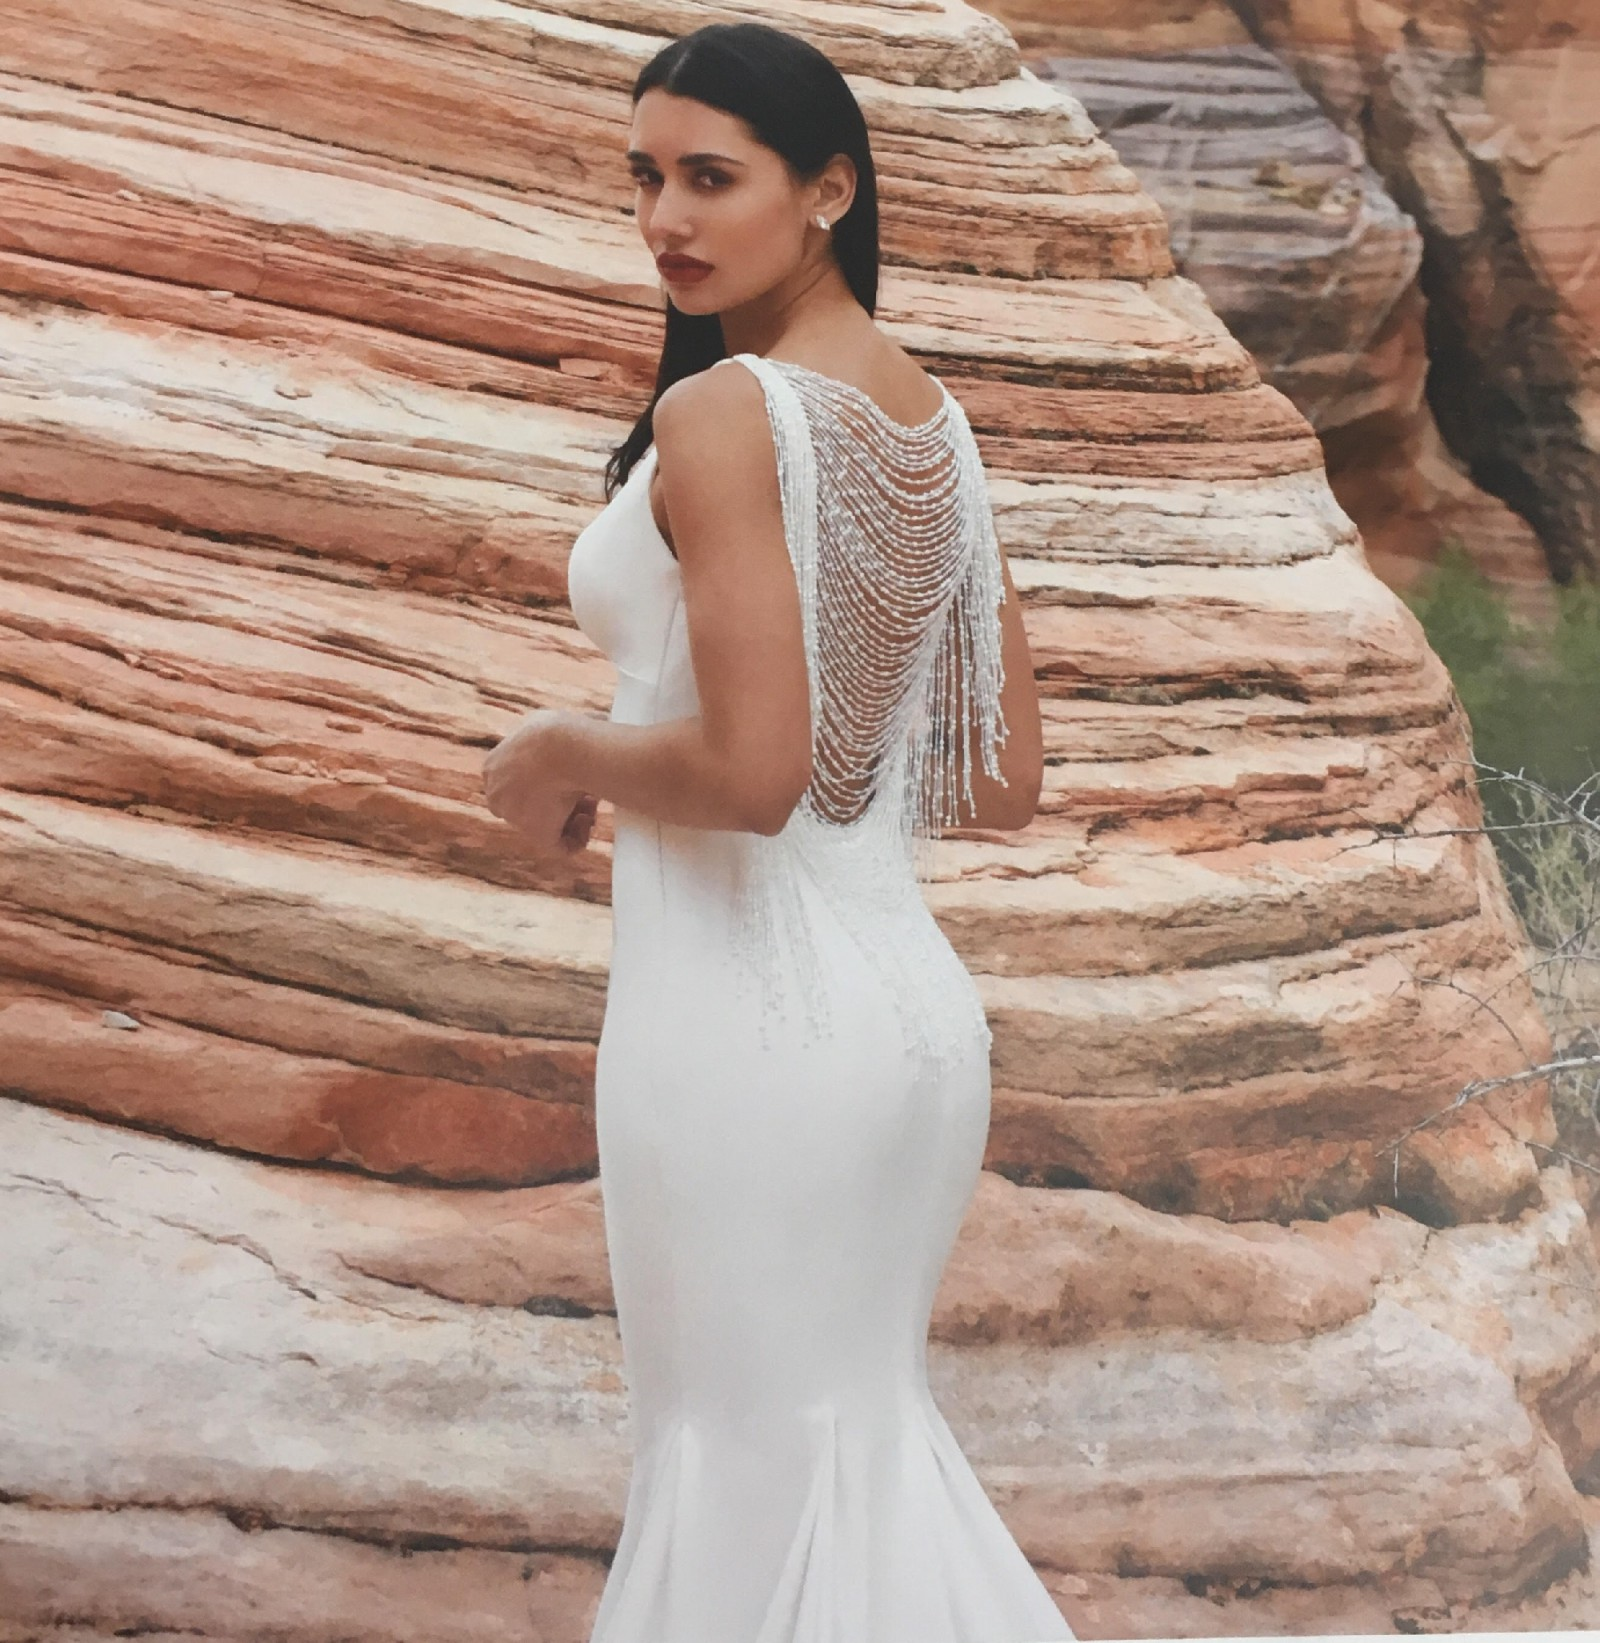 Dando London Destiny New Wedding Dress On Sale 74% Off